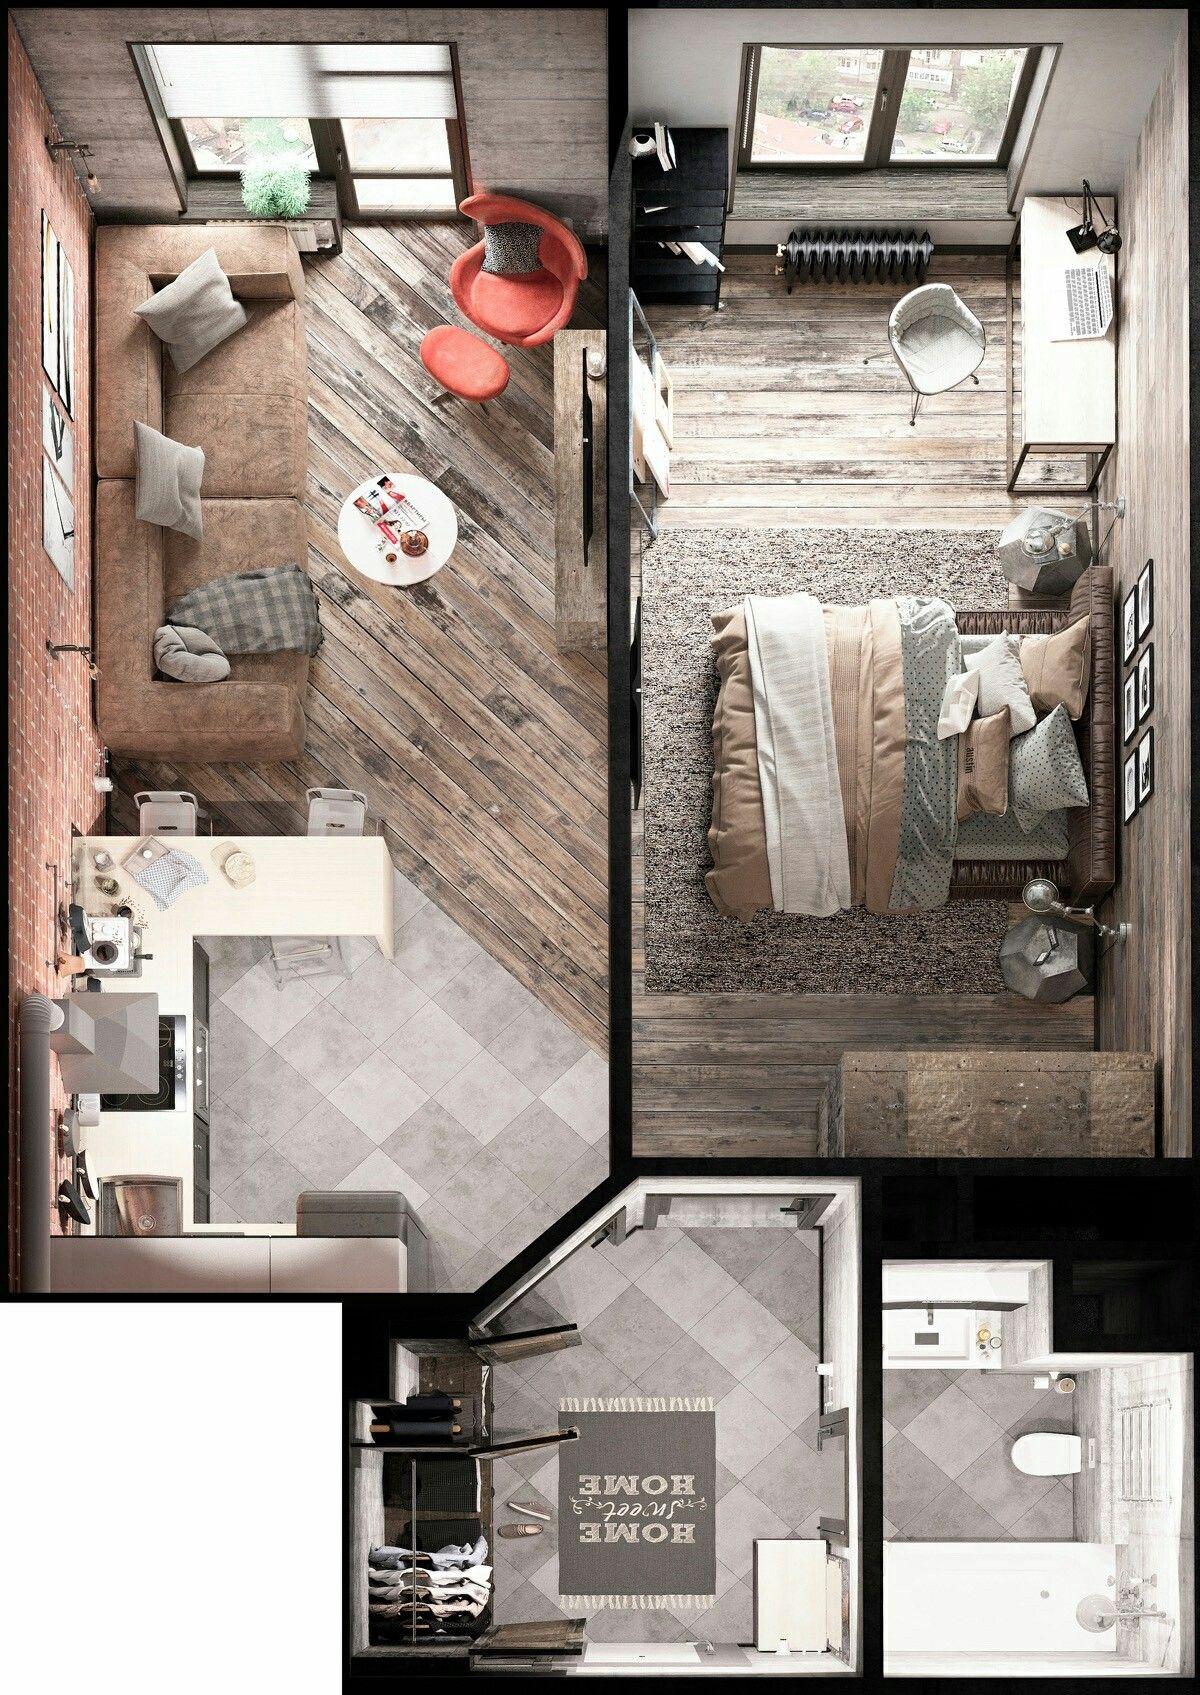 Easy ways to update your apartment decor studio floor plans bedroom also apartamento moderno com quarto pinterest rh